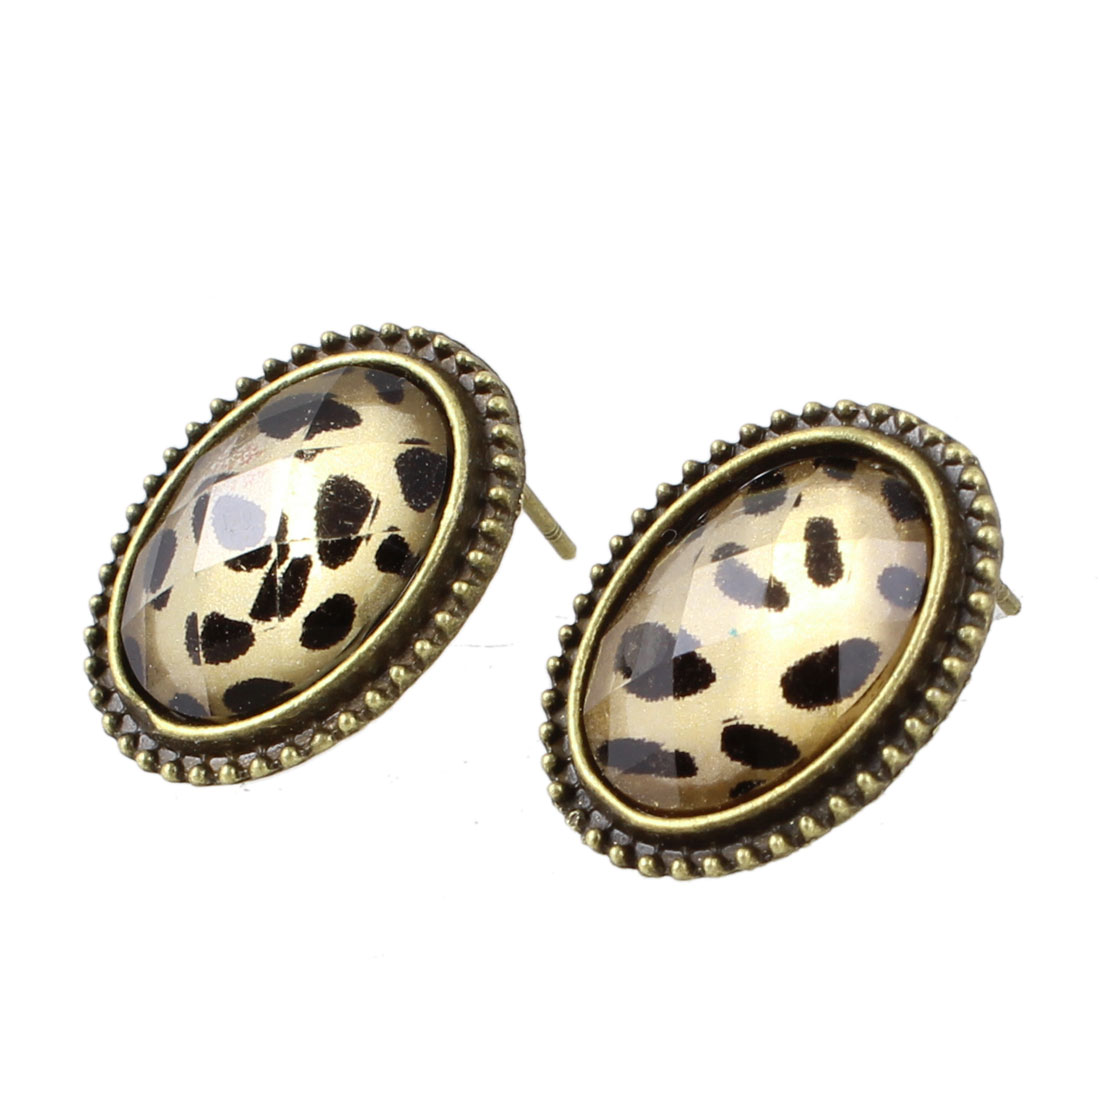 Pair Plastic Crystal Decor Oval Shape Earrings Ornament for Women